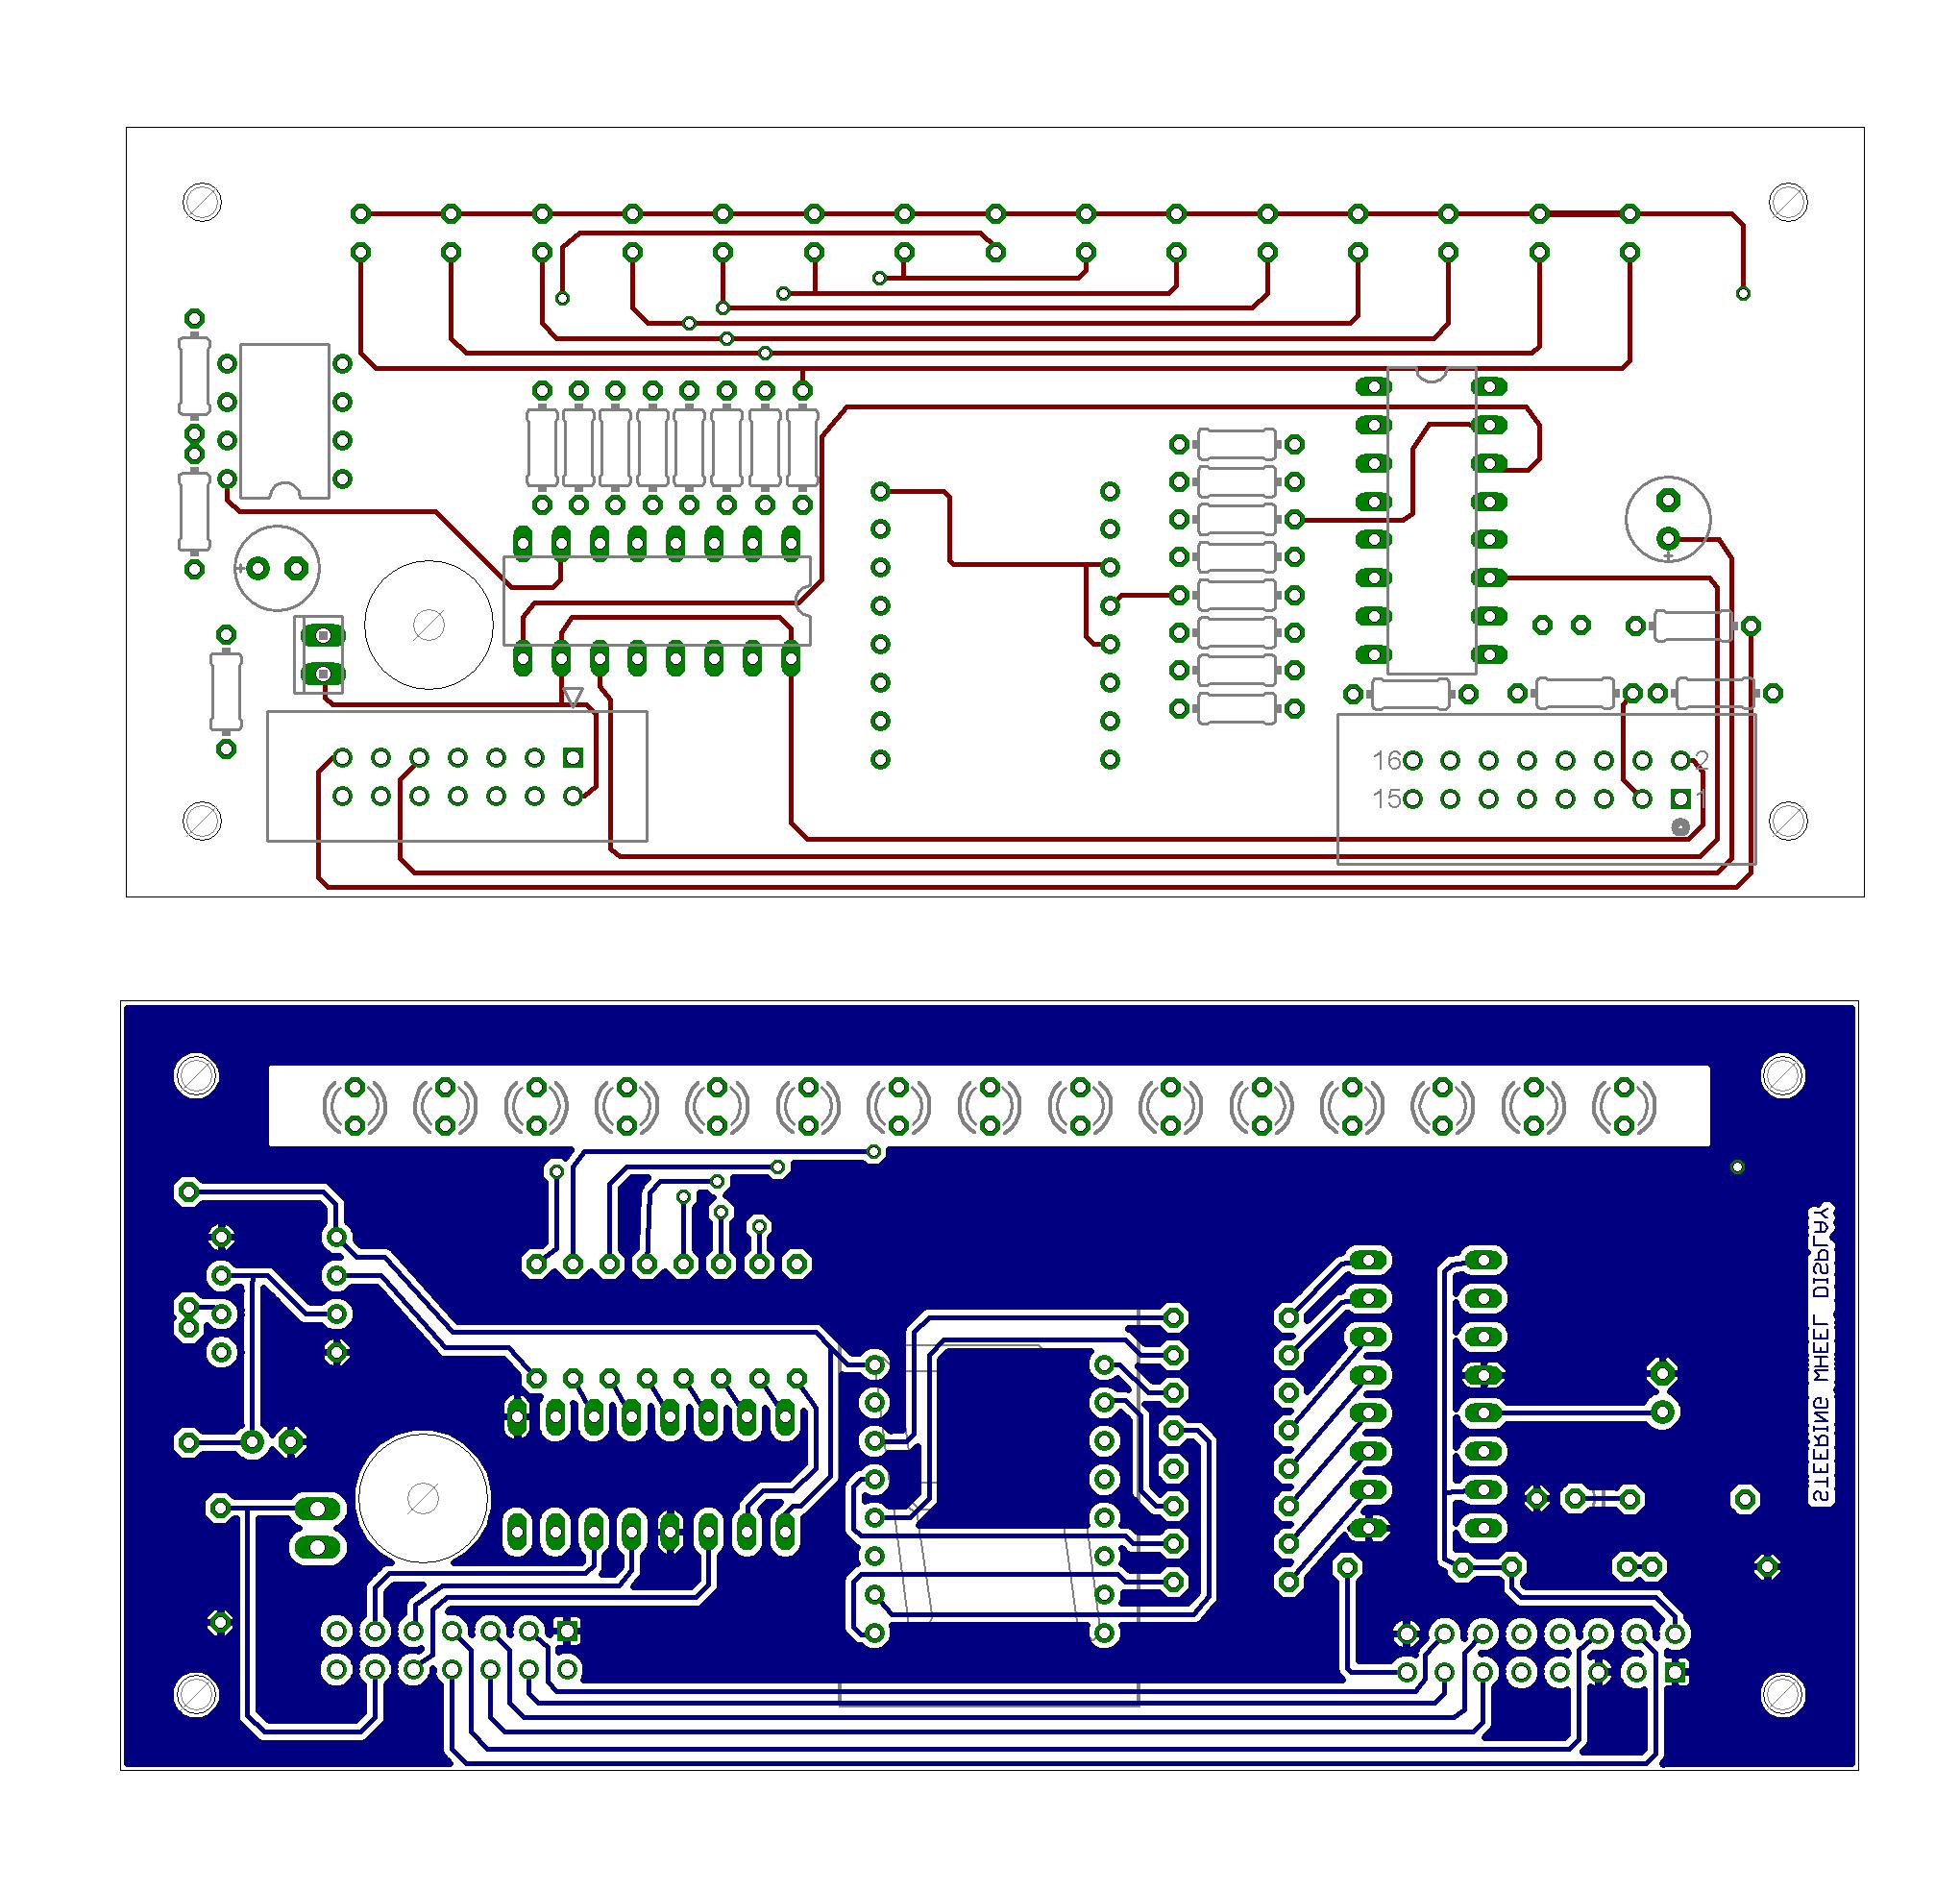 Dorable Eaglesoft Cad Elaboration - Electrical Diagram Ideas ...